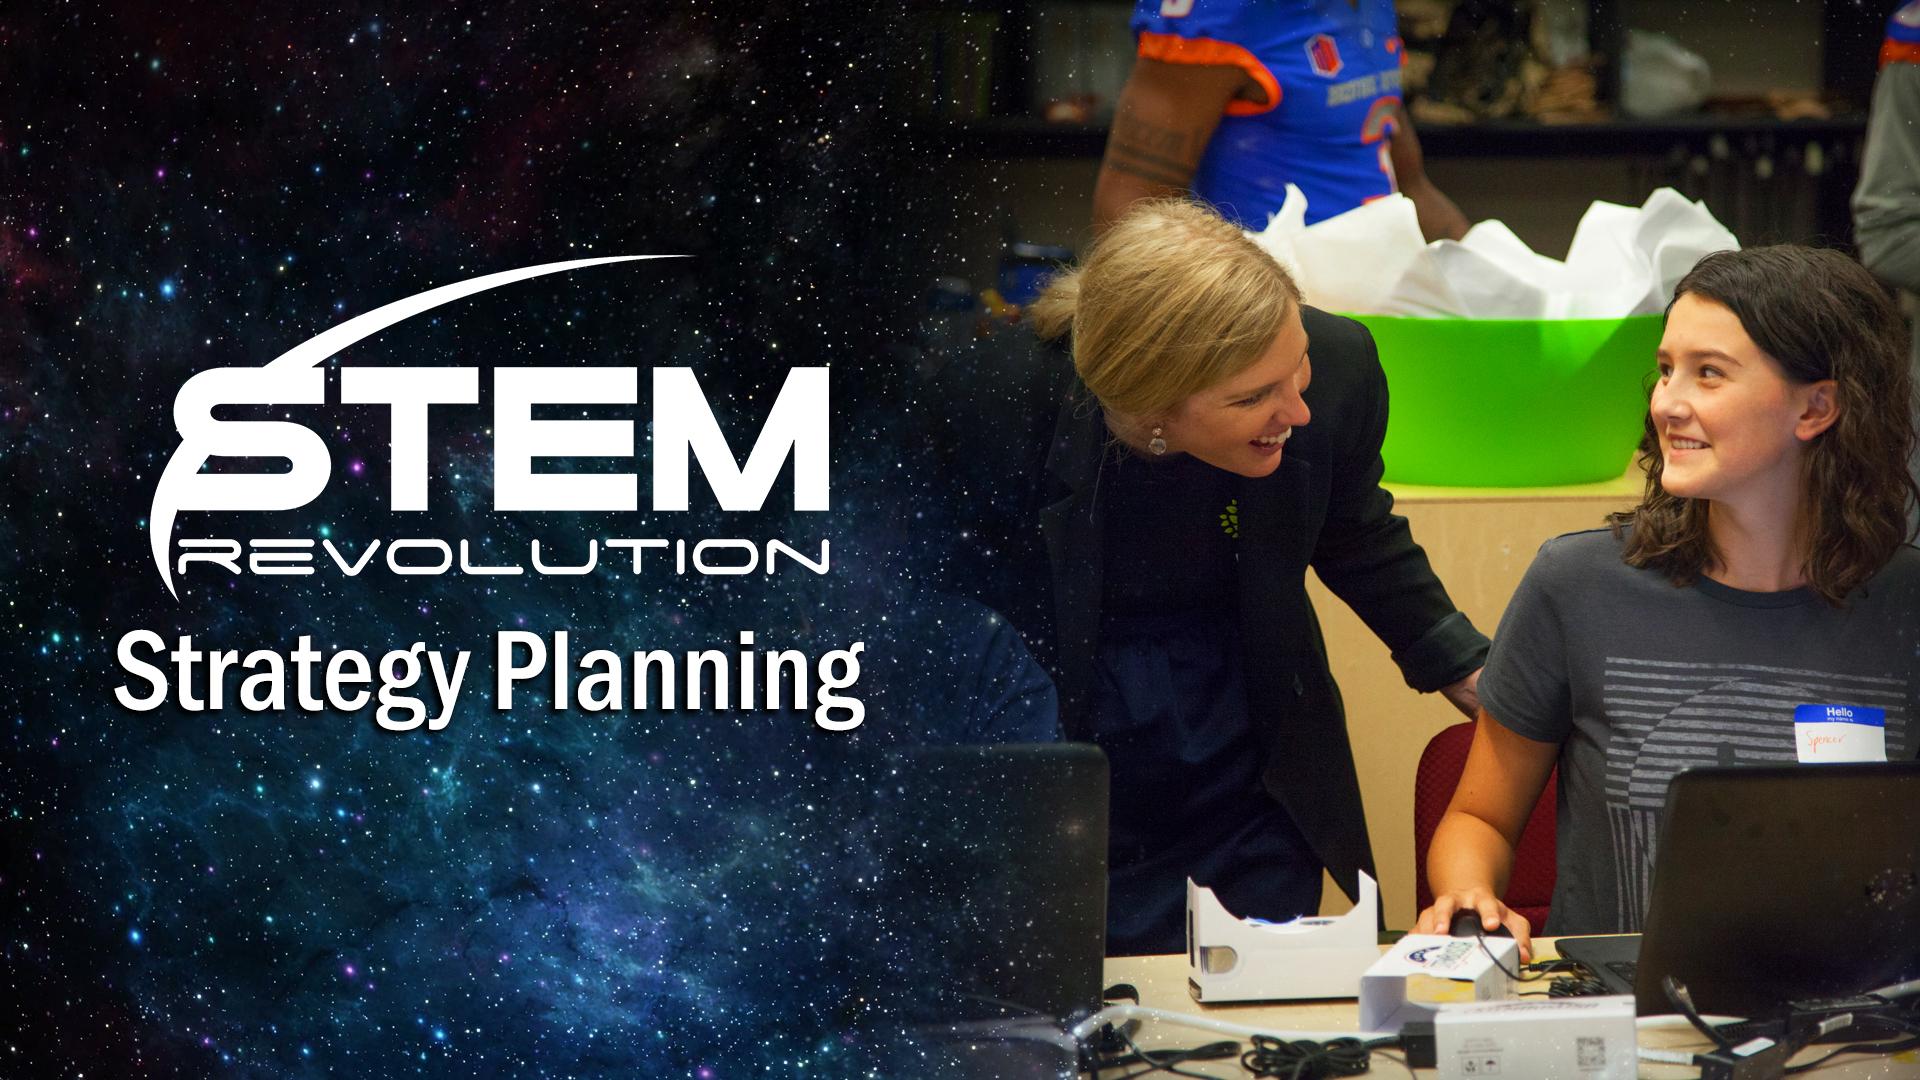 STEM Revolution - Strategy Planning